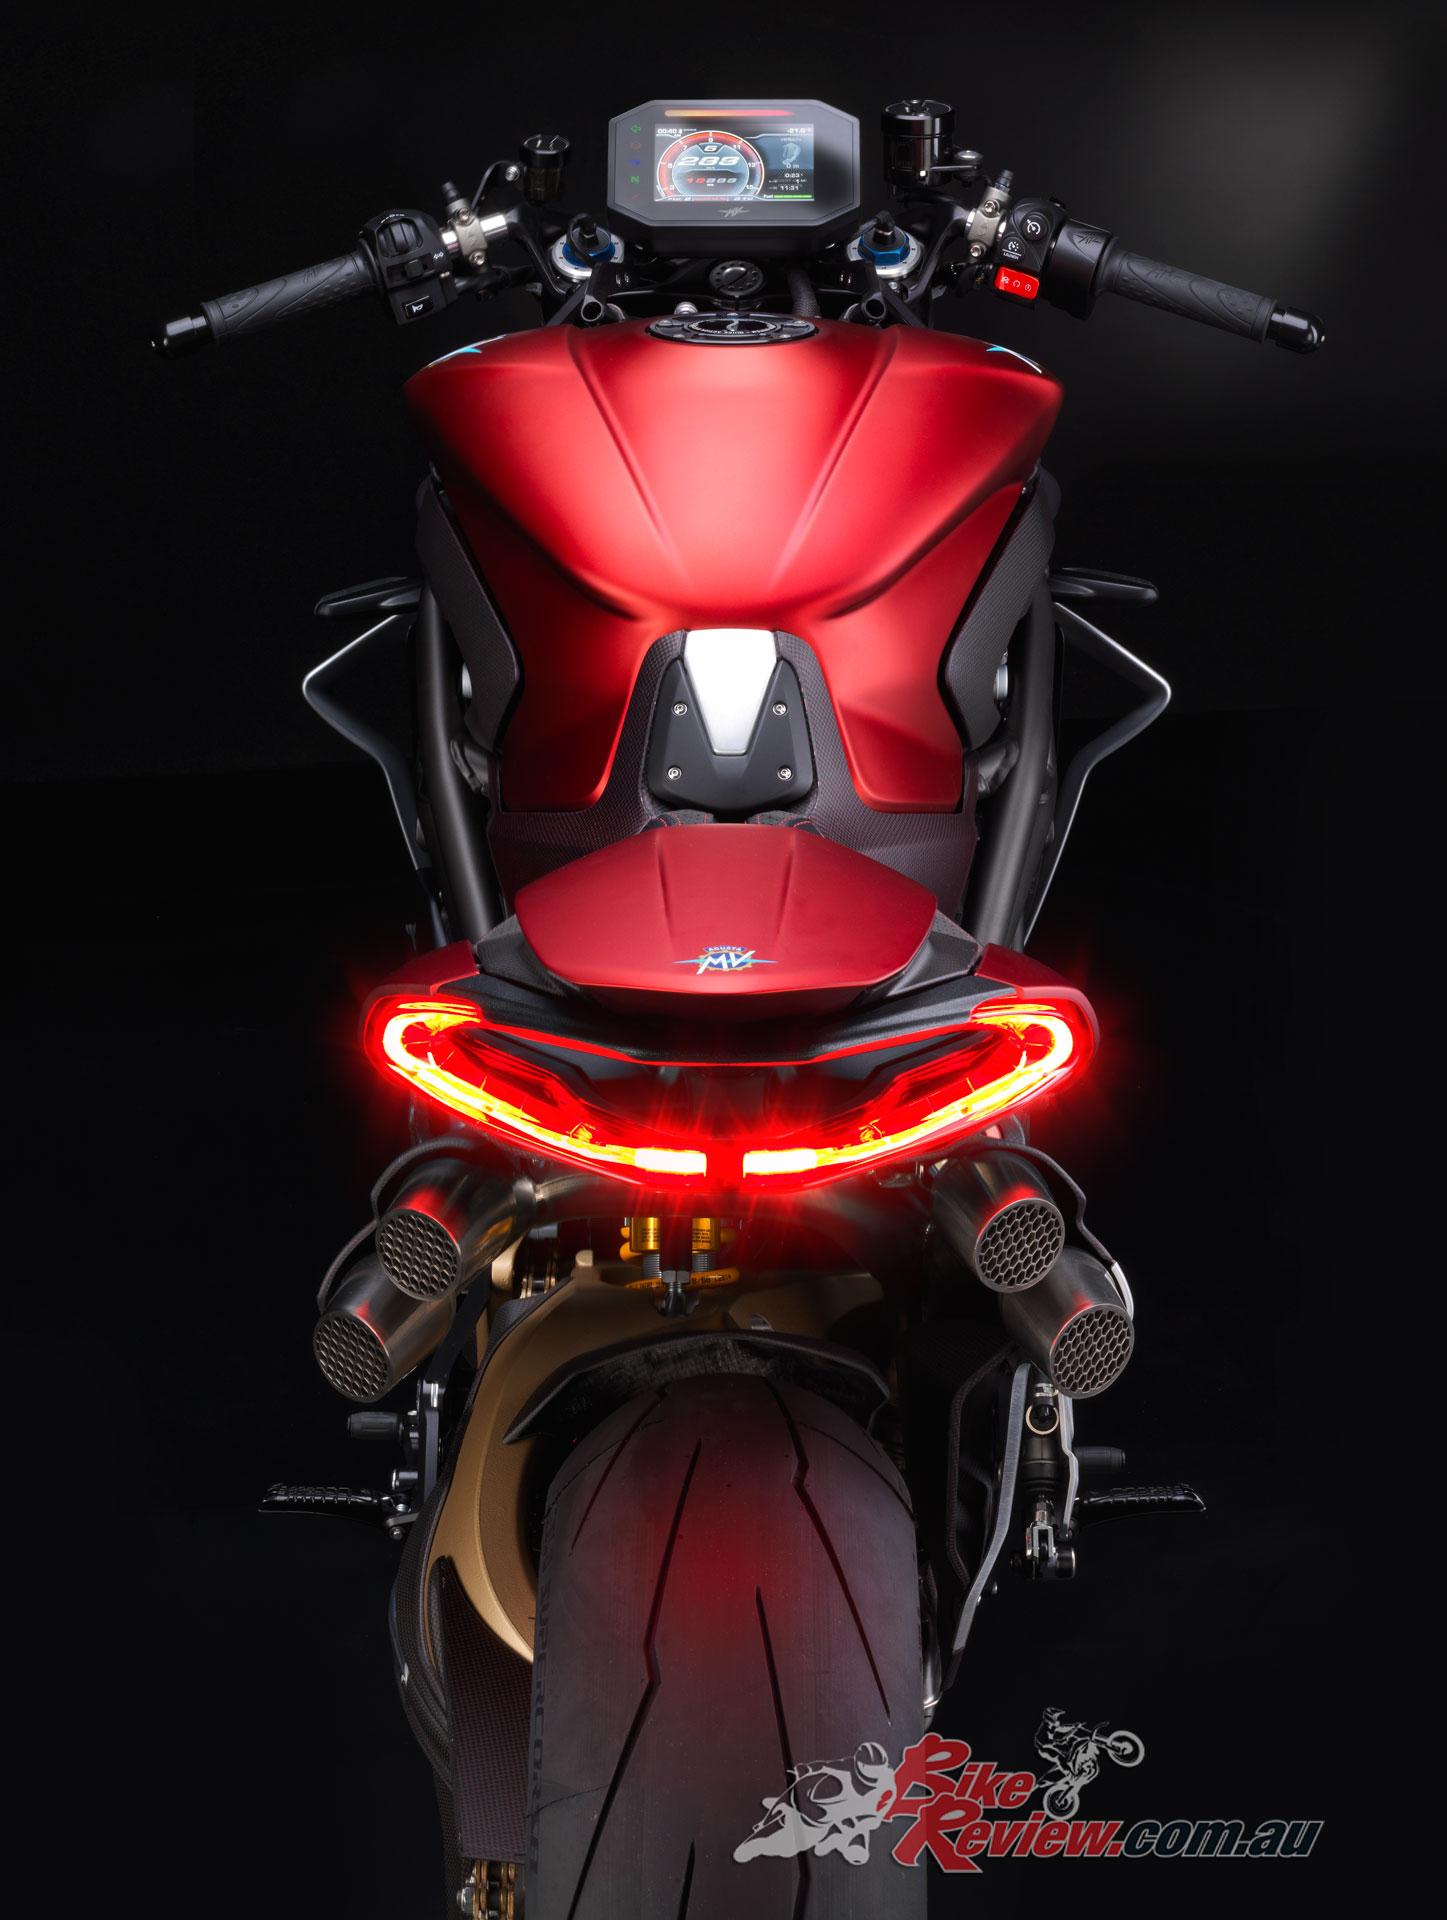 2019 MV Agusta Brutale 1000 Serie Oro